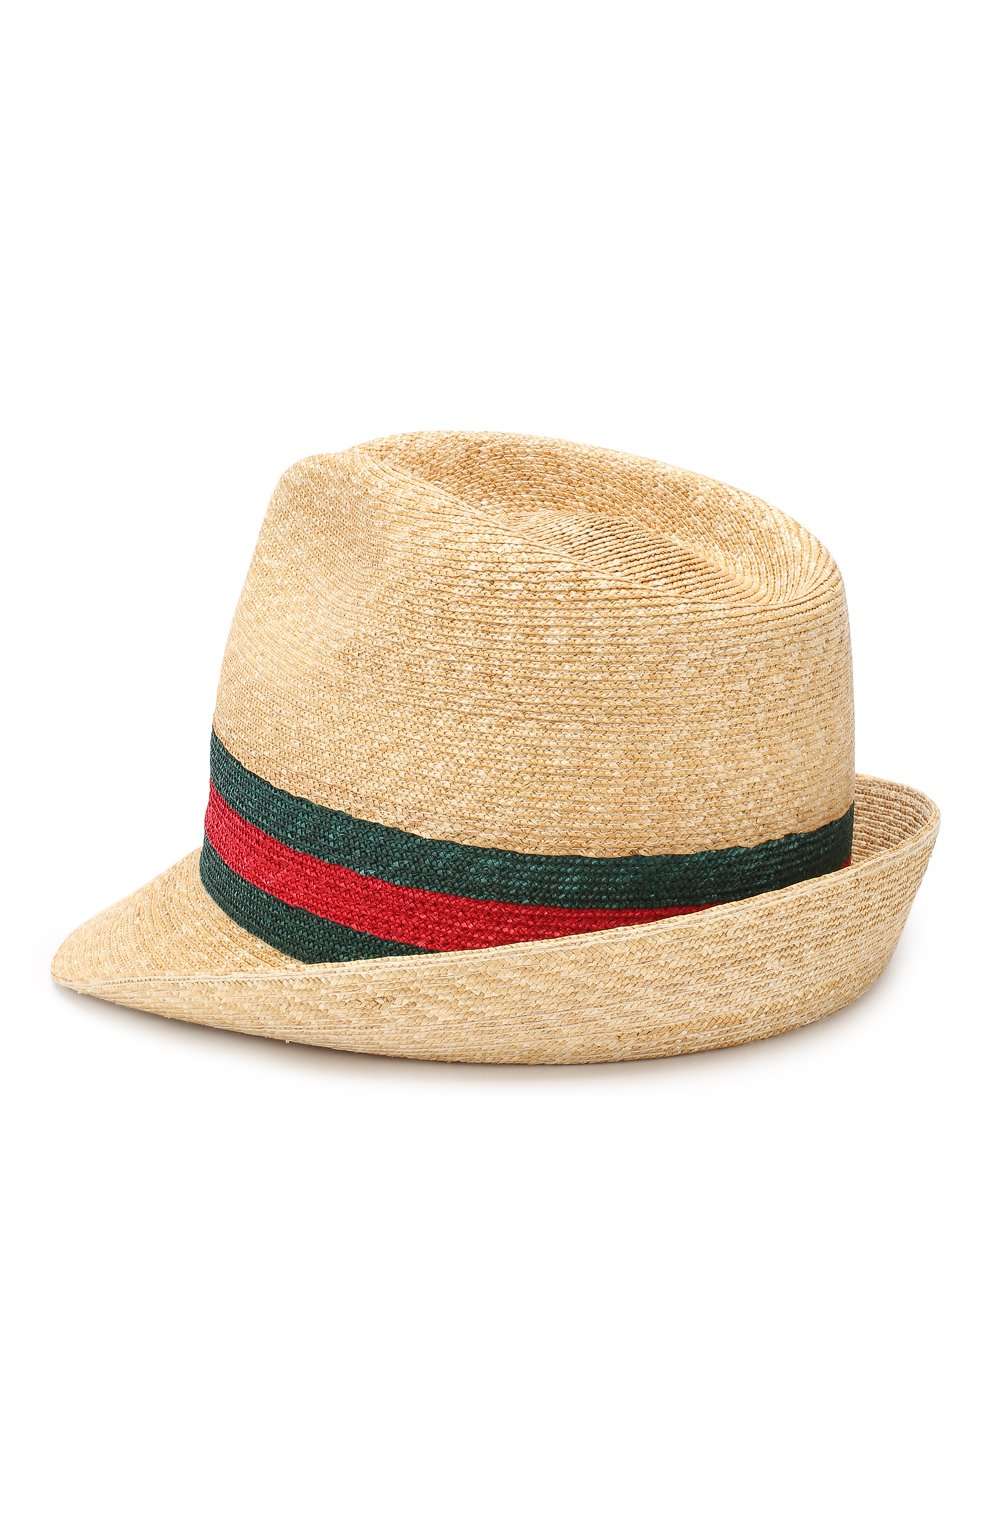 Плетеная шляпа | Фото №2